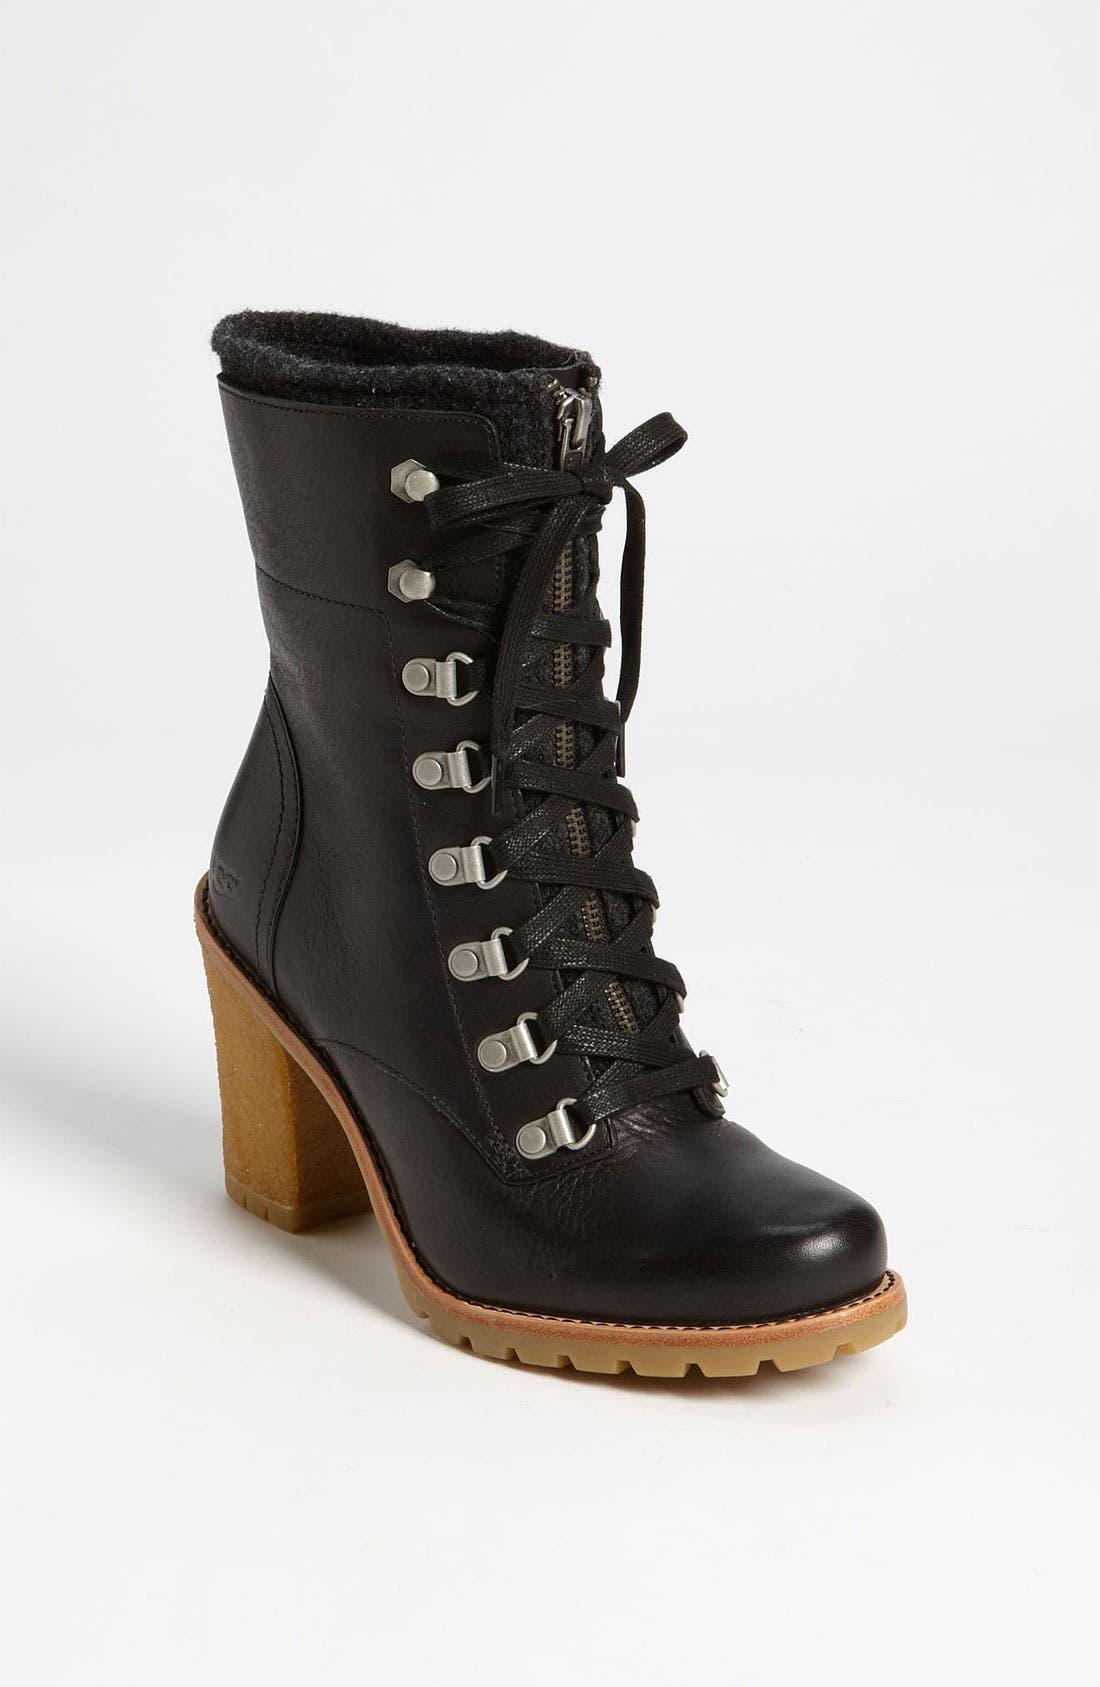 UGG<SUP>®</SUP> Australia 'Fabrice' Boot, Main, color, 001